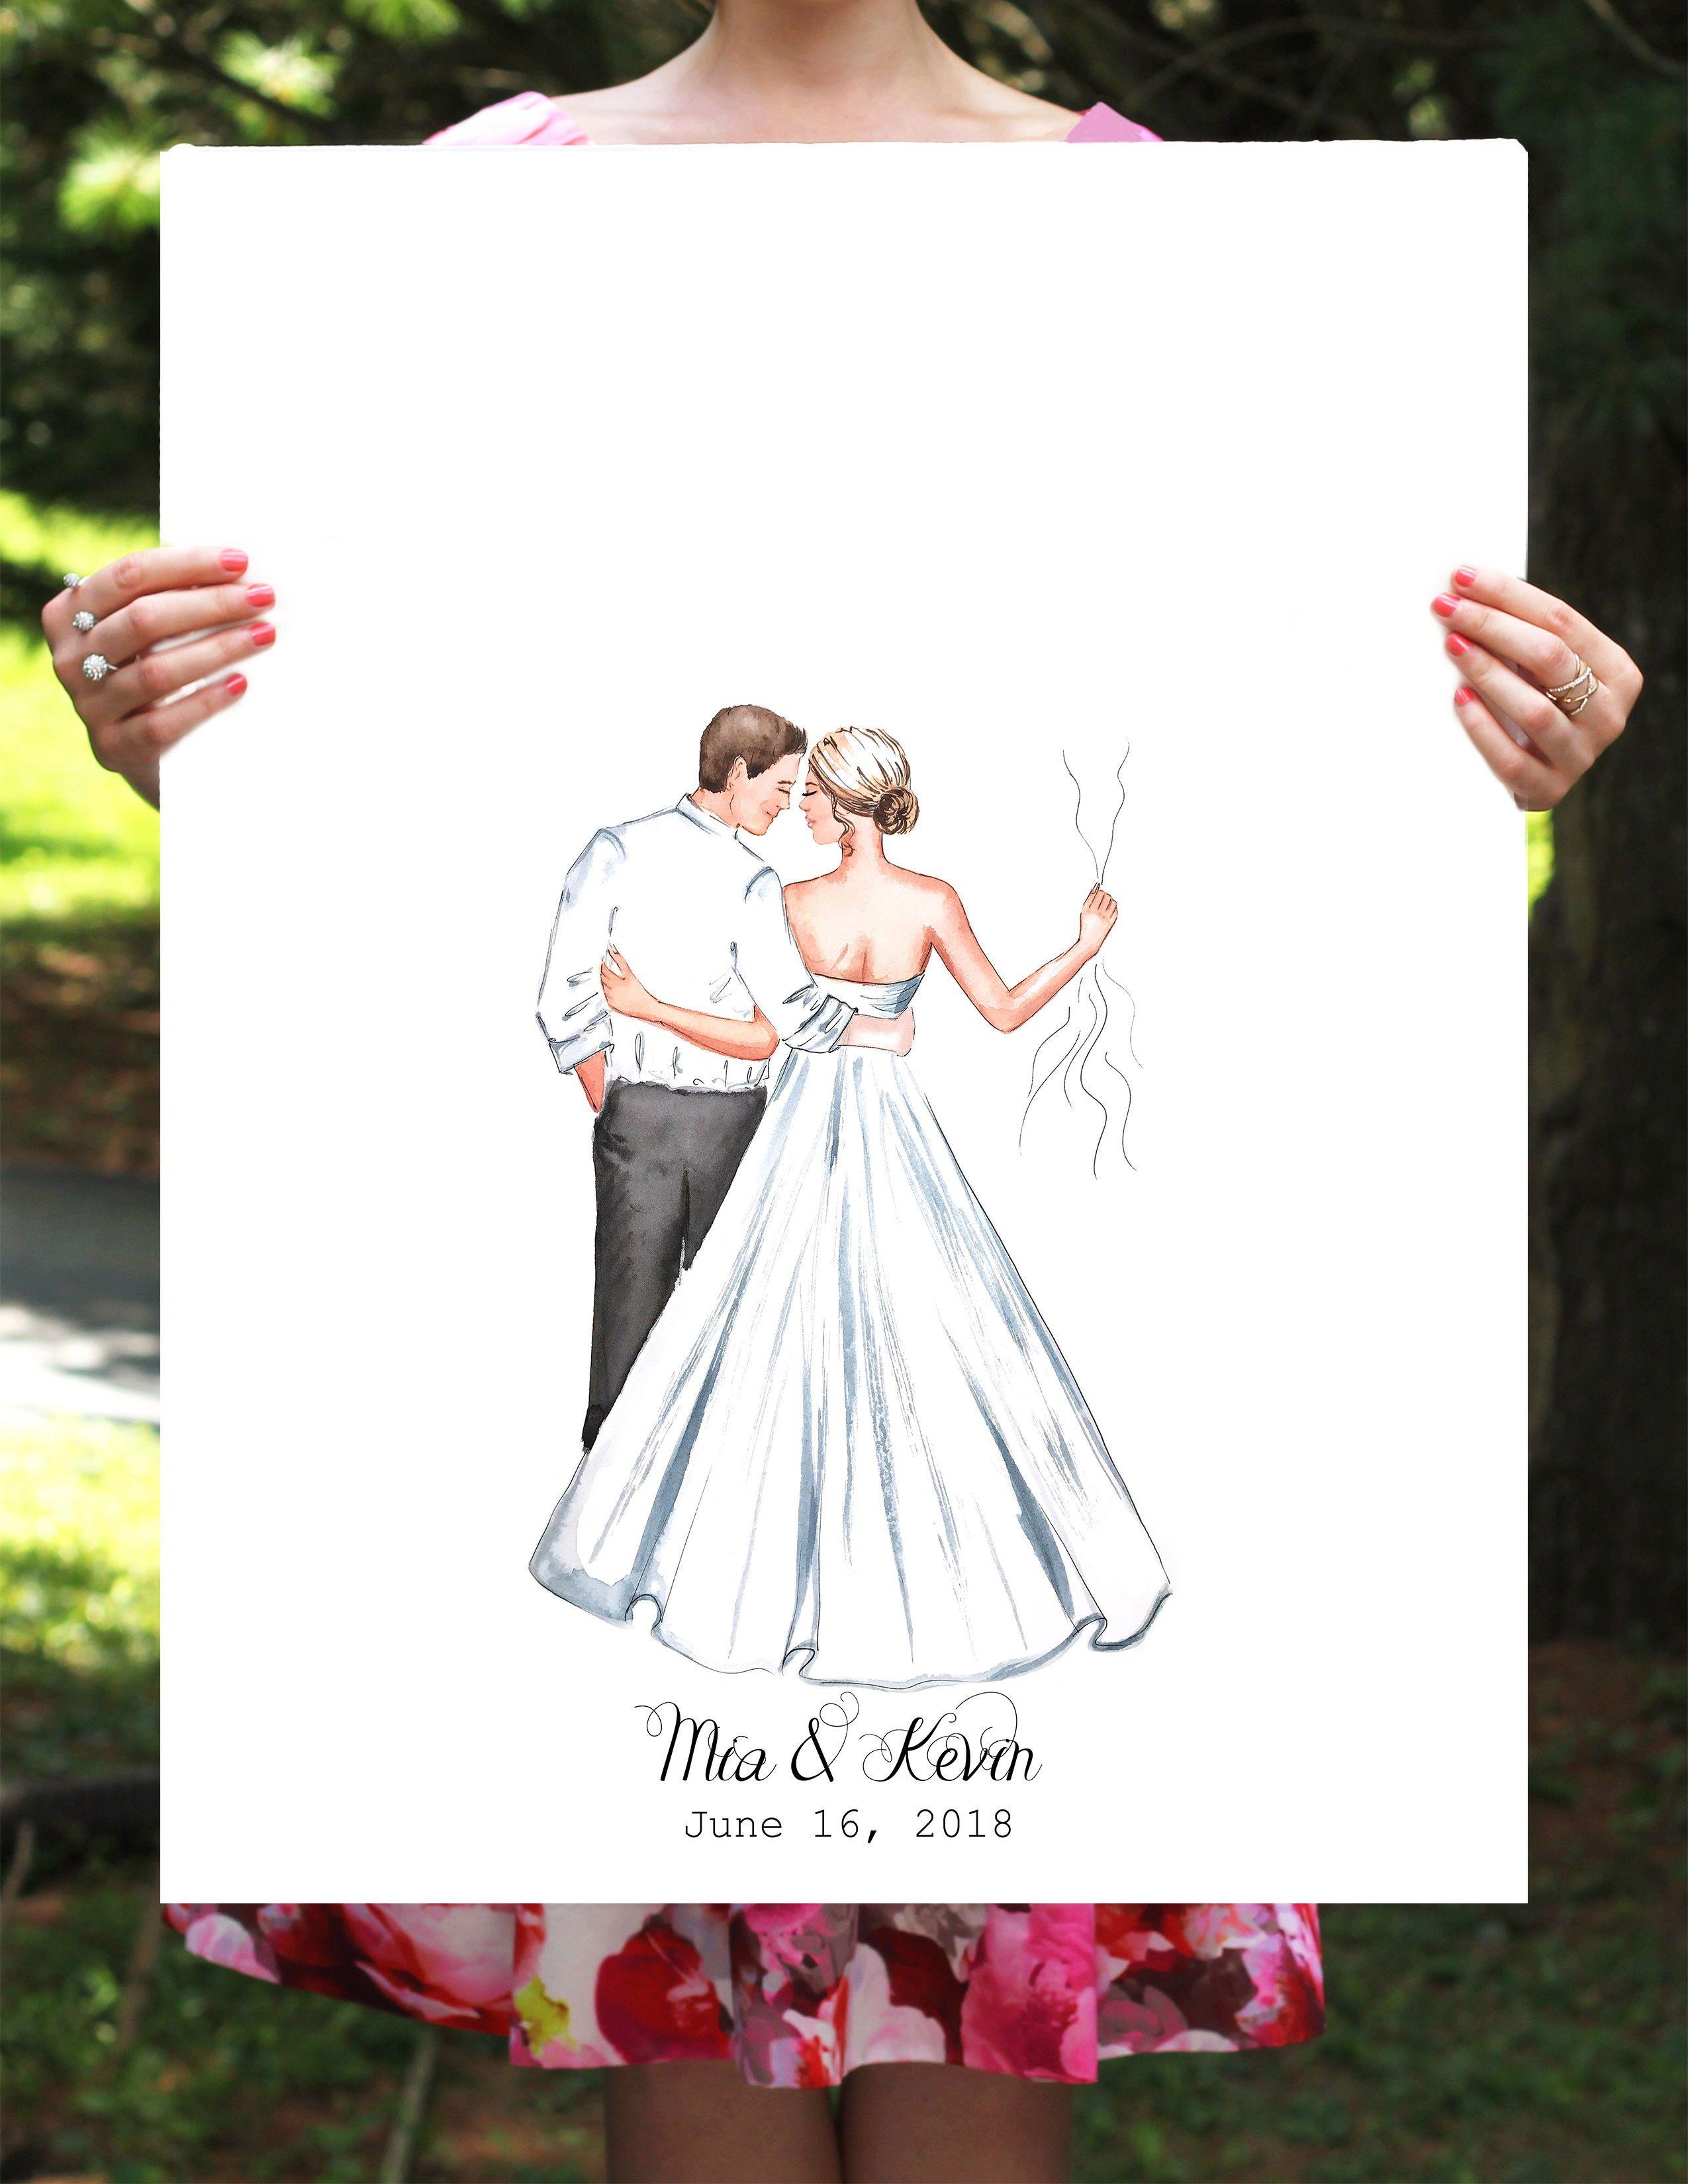 Thumb Print Wedding Guest Book Alternative Wedding Guest Book Sign In Printable Wedding Guest Book Wedding Tree Alternative Wedding Guest Book Sign Wedding Guest Book Etsy Wedding Guest Book